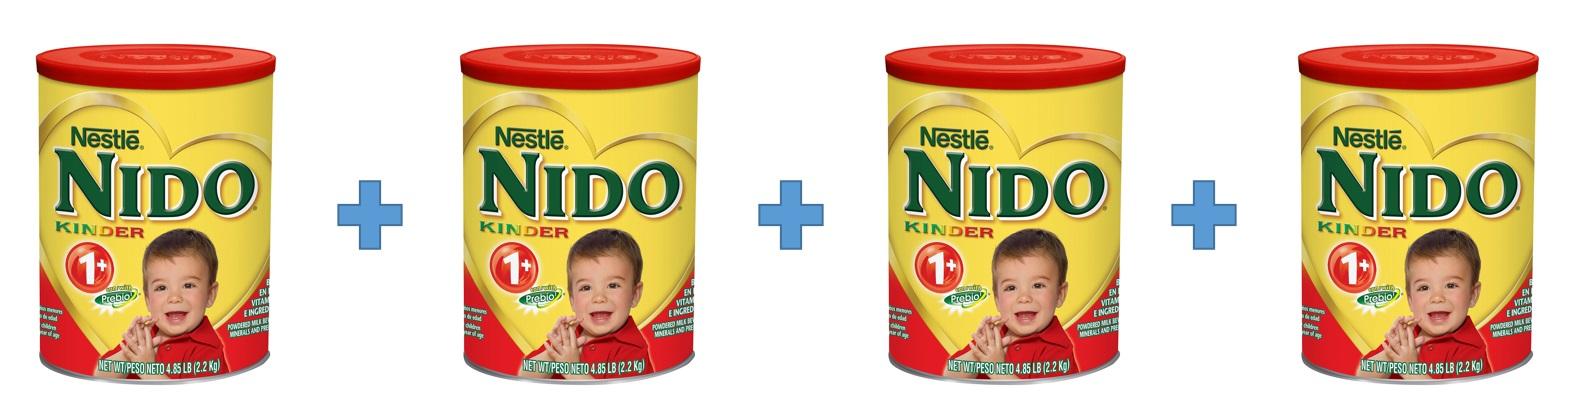 nido3